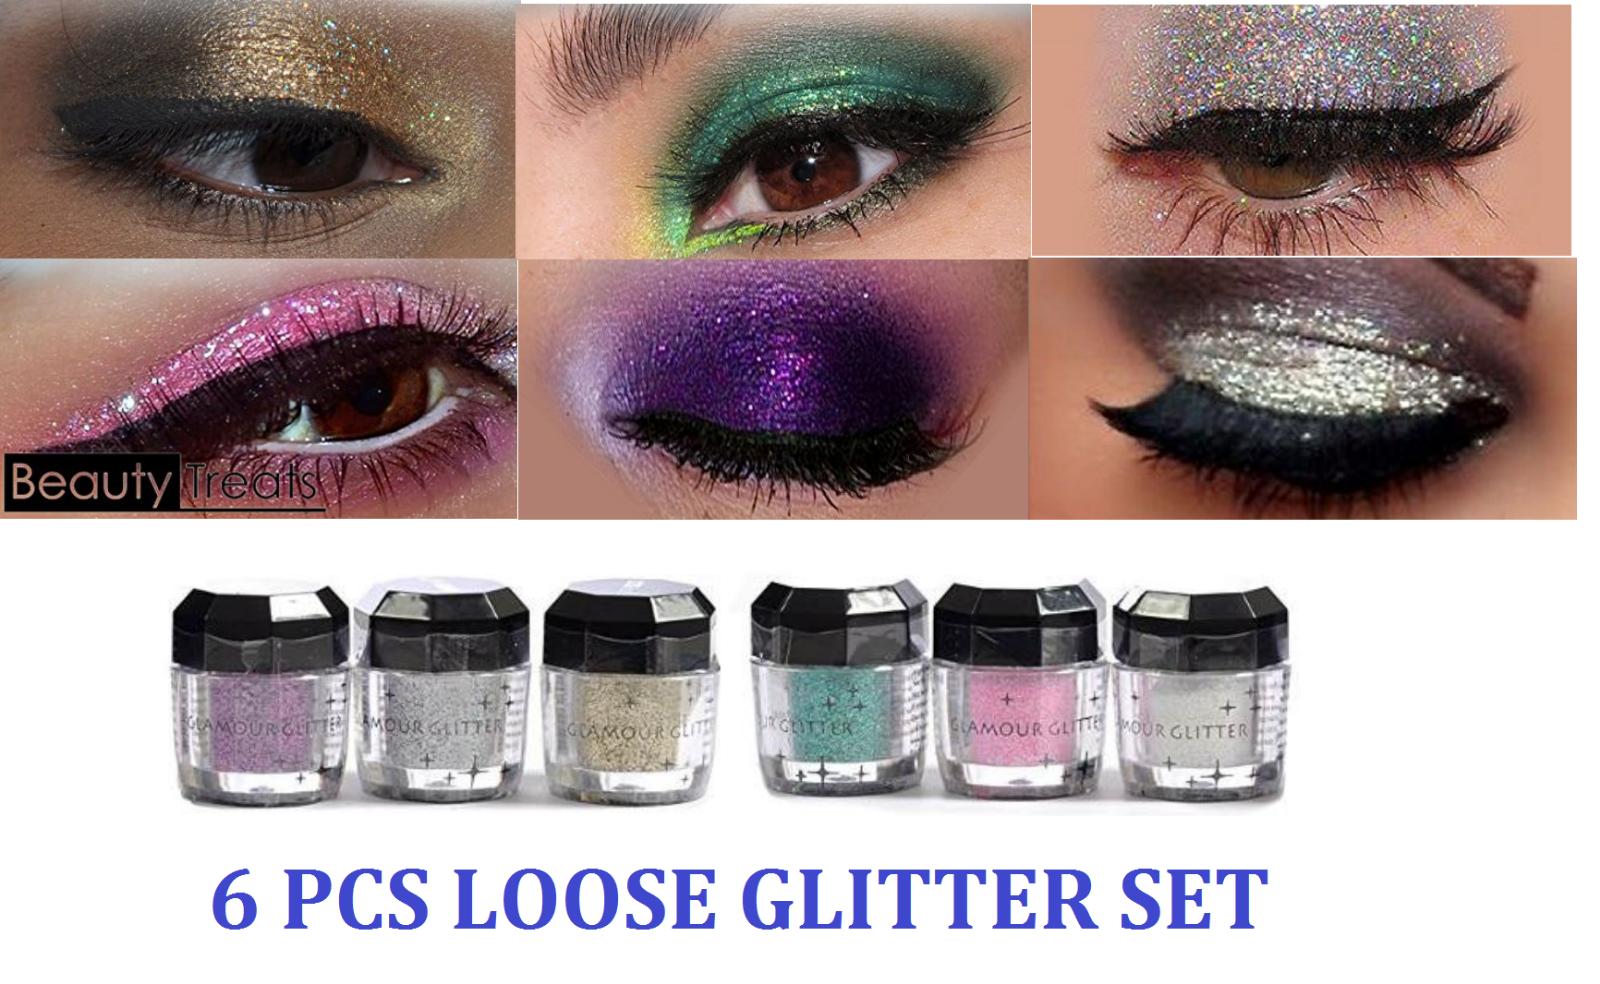 12 Beauty Treats Cosmetics Eye shadow Color Makeup PRO GLITT